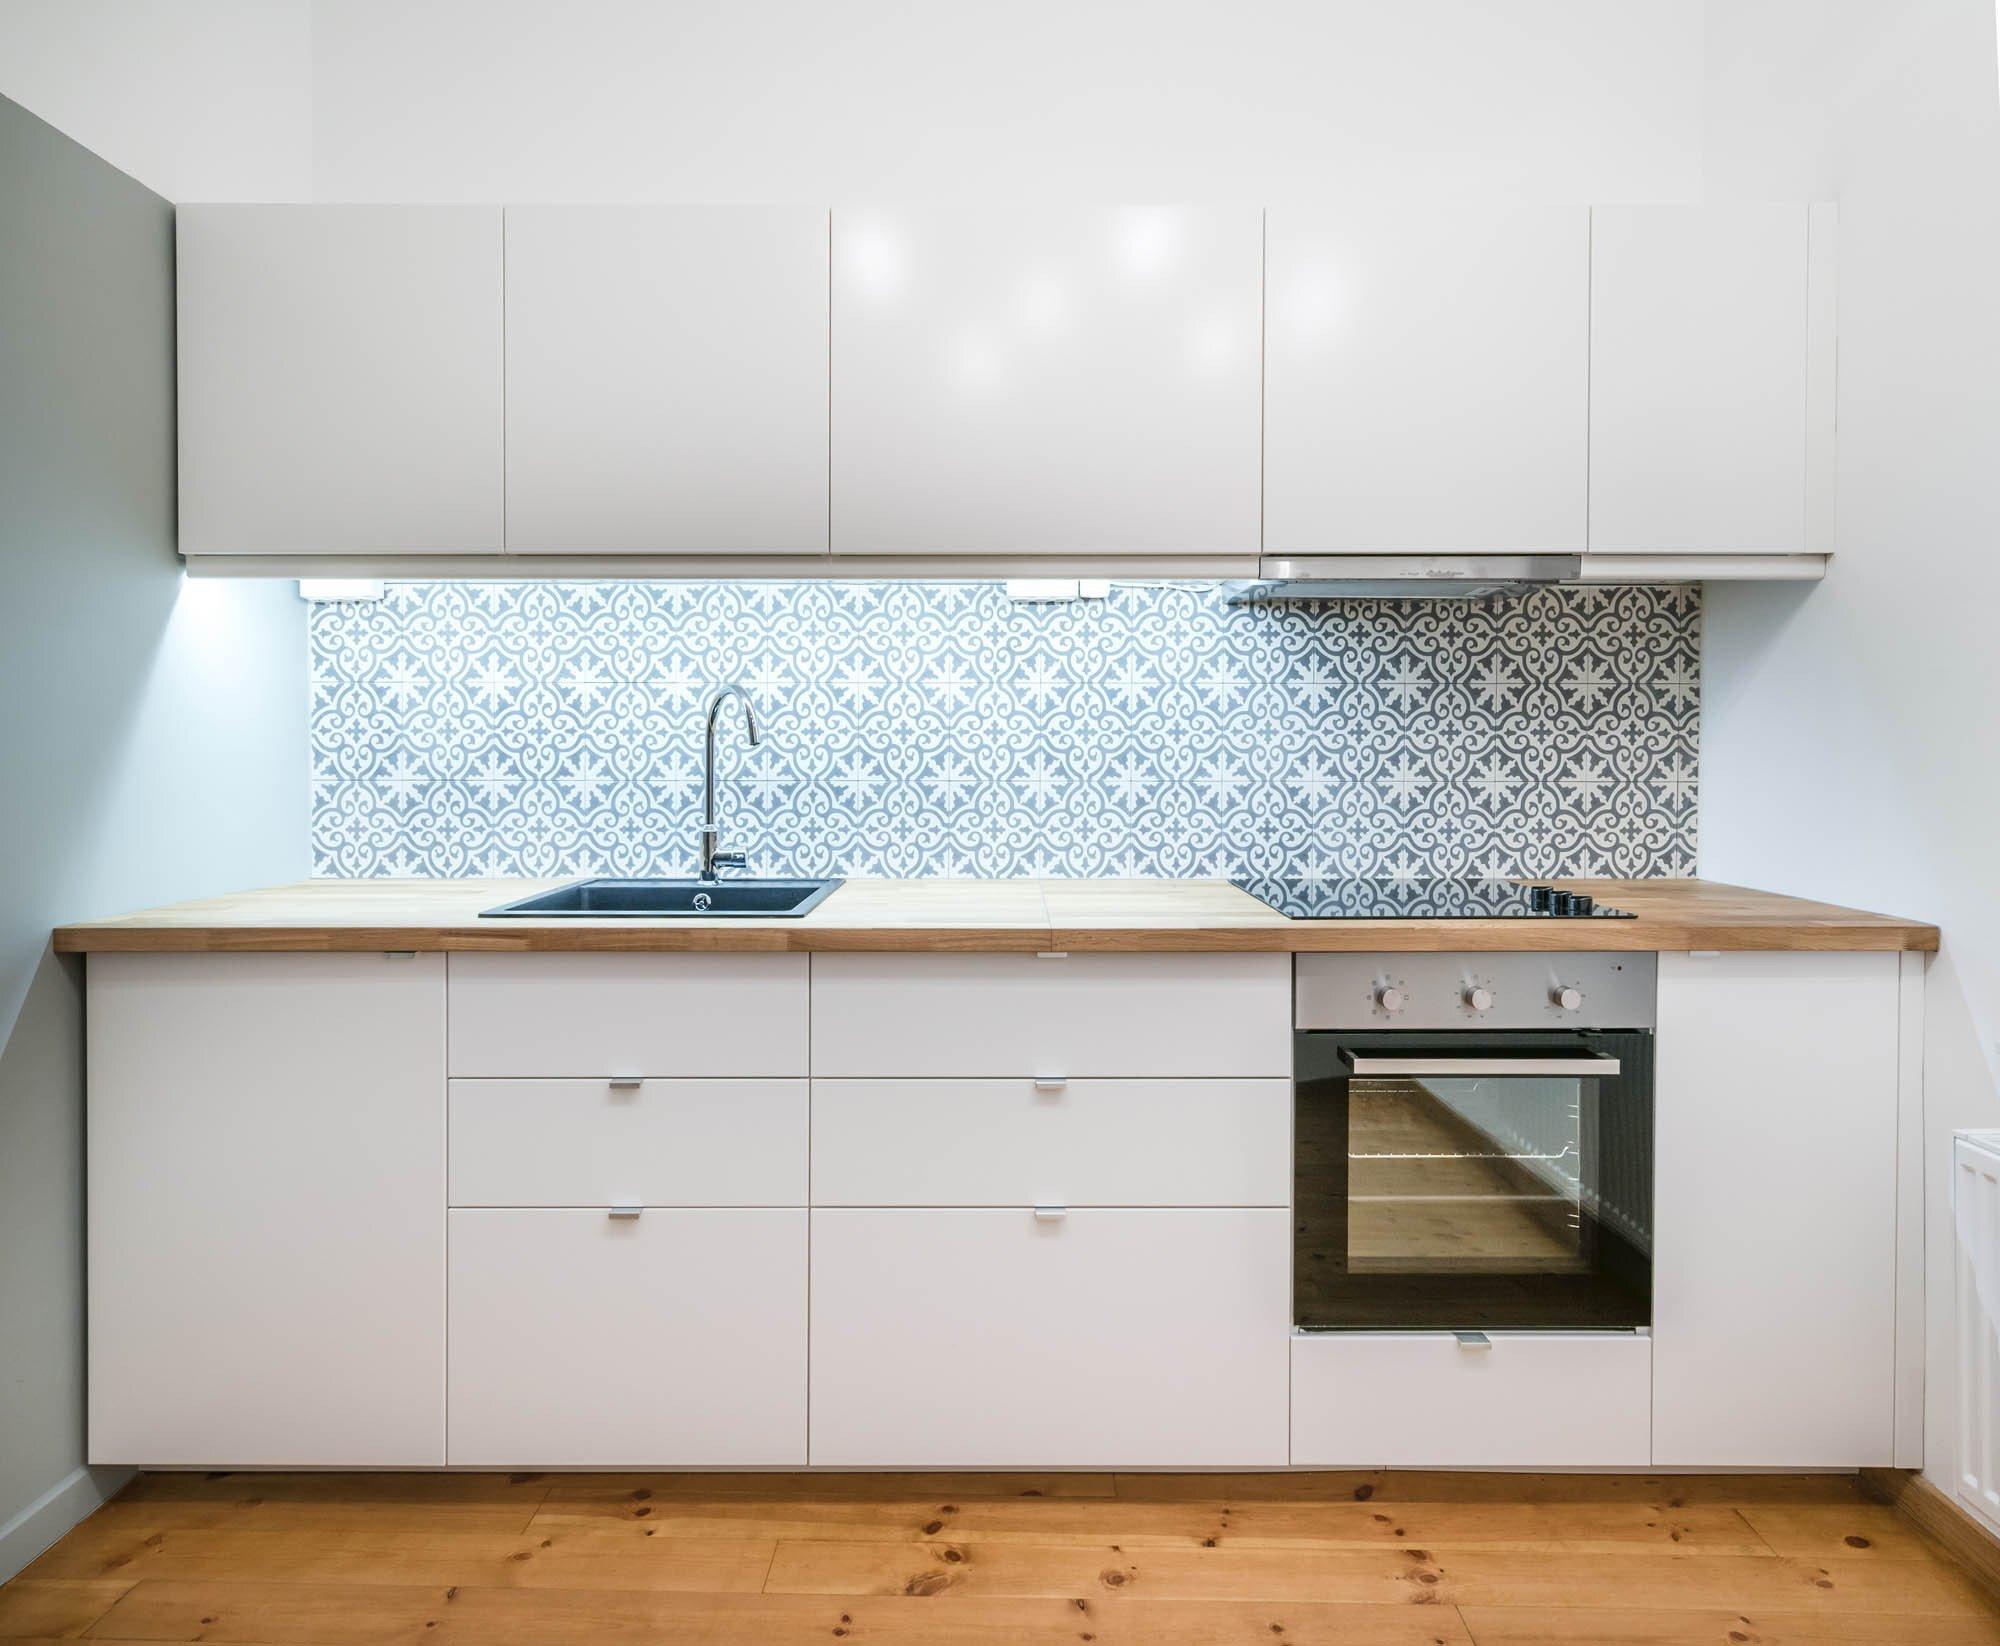 Strict Elegance - Batlab Architects - Hungary - Kitchen - Humble Homes